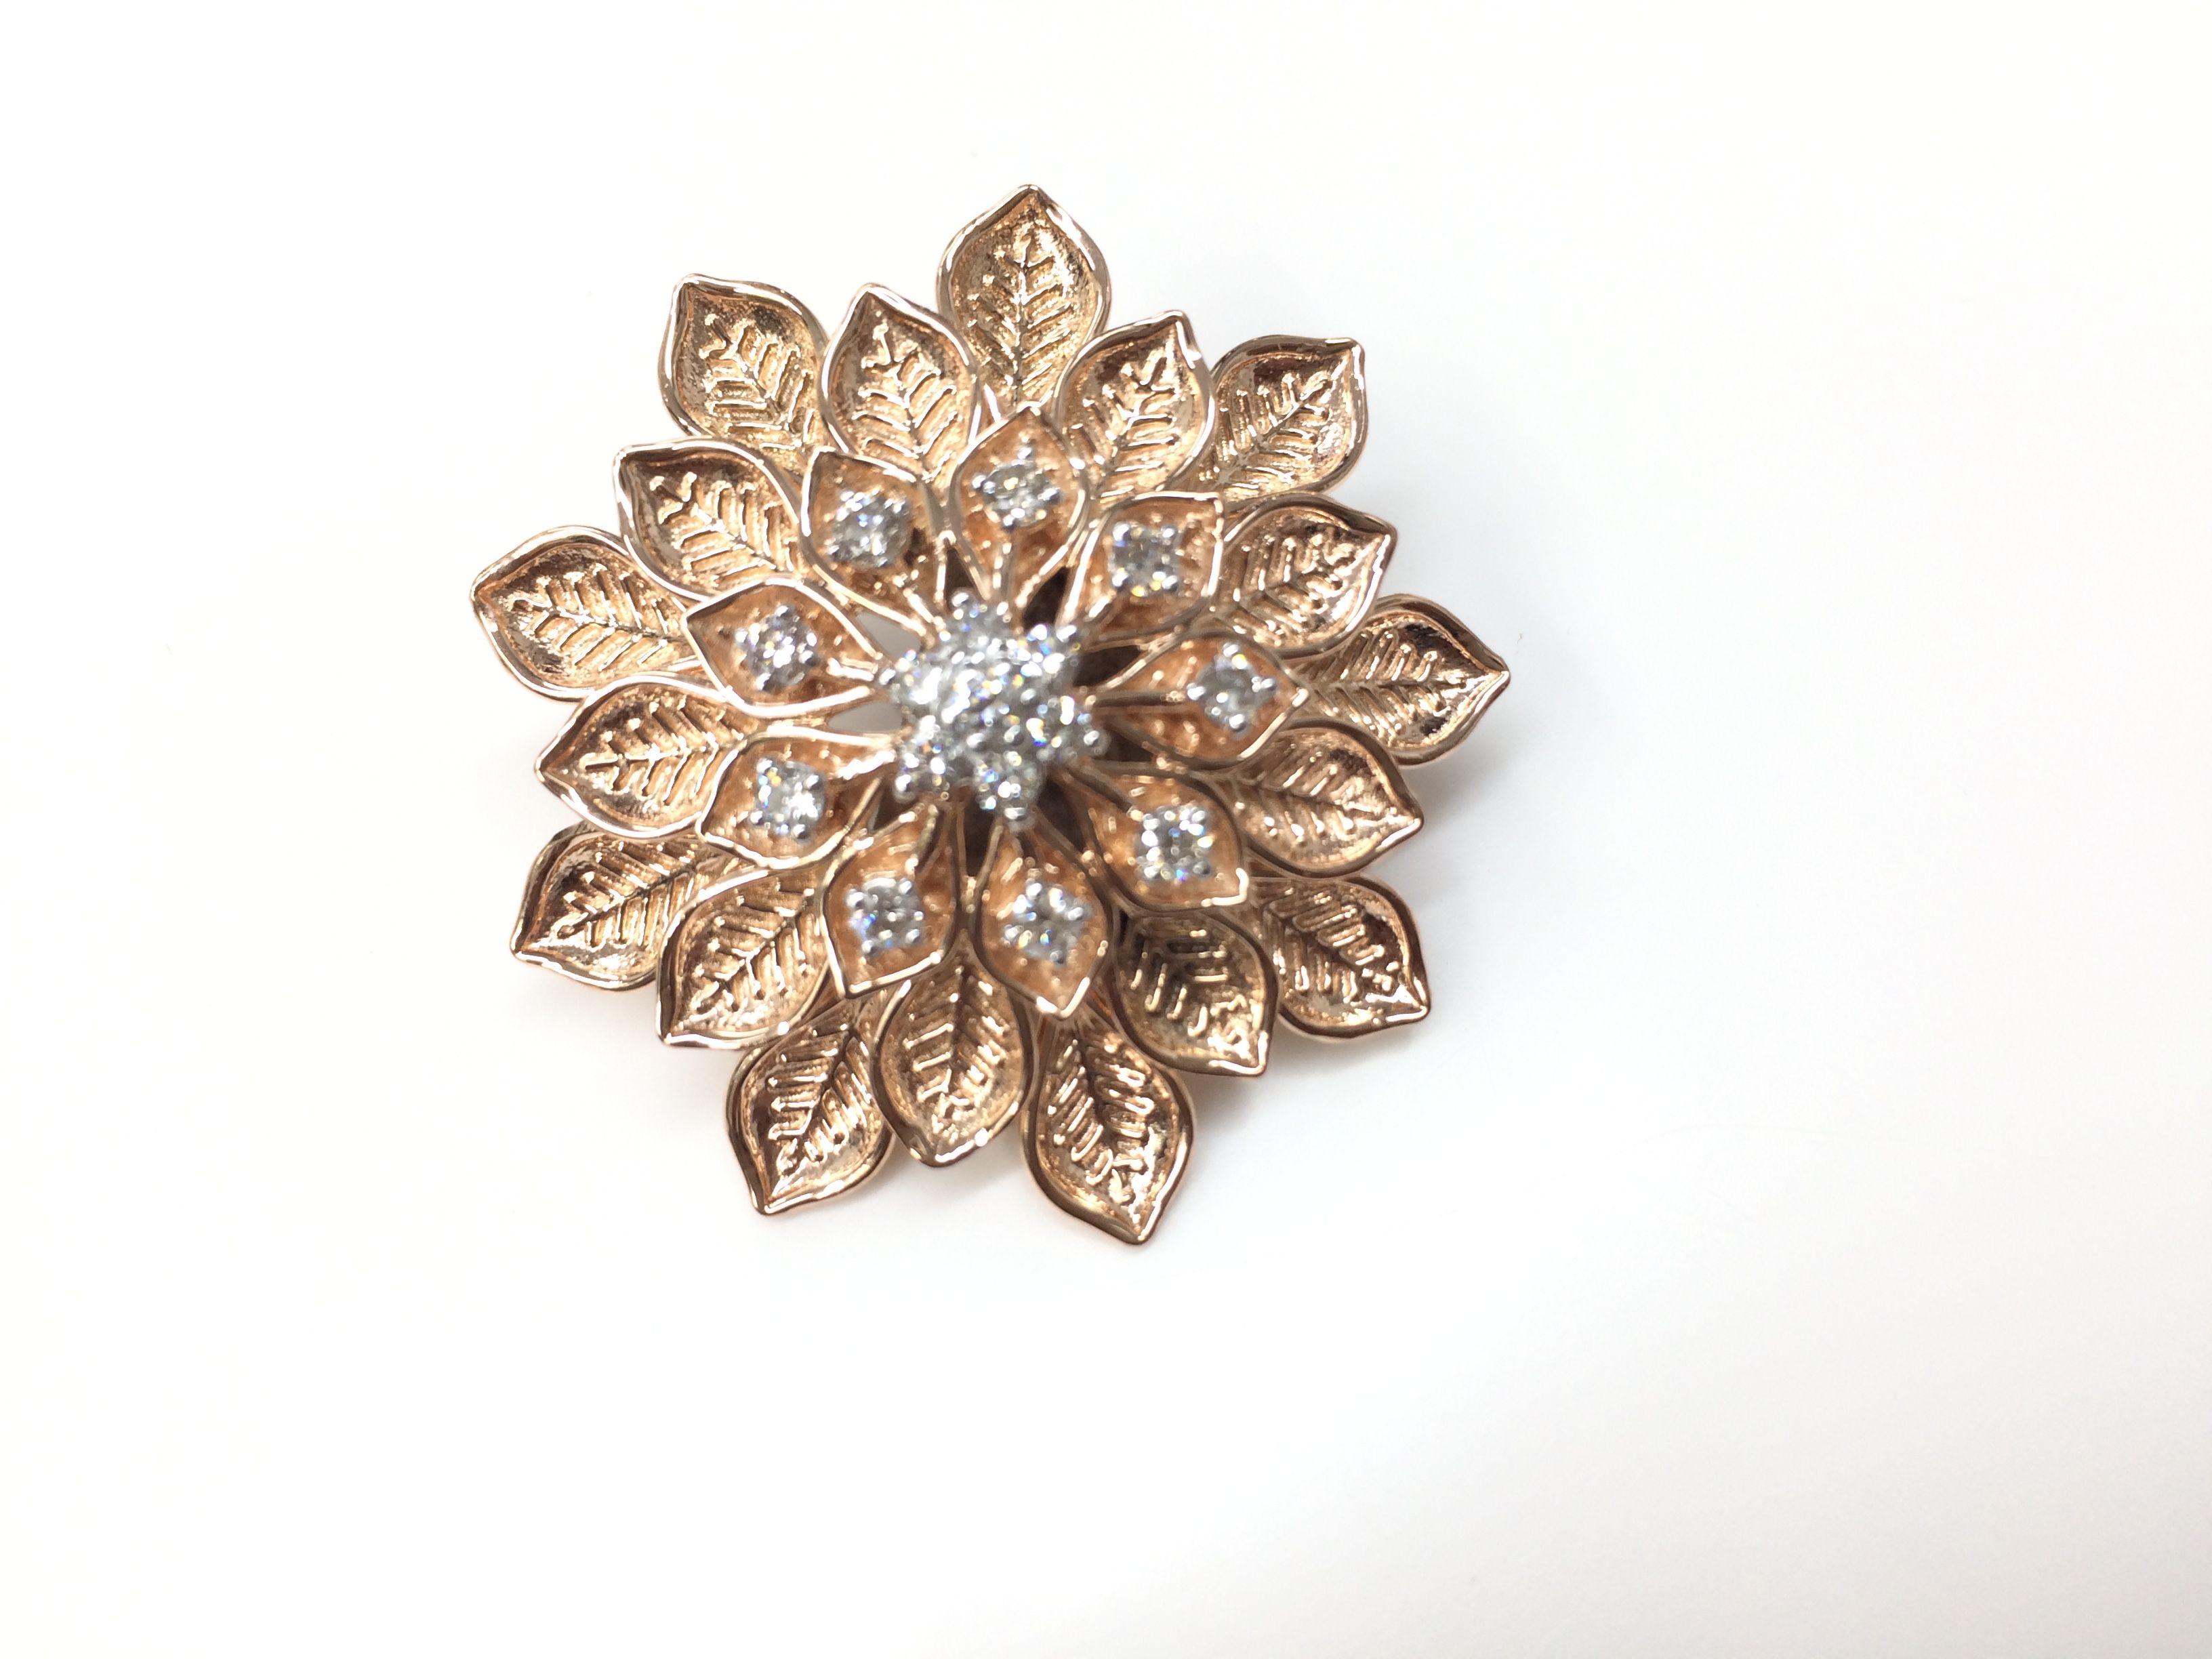 Pin by ashish agrawal on pendant pinterest pendants